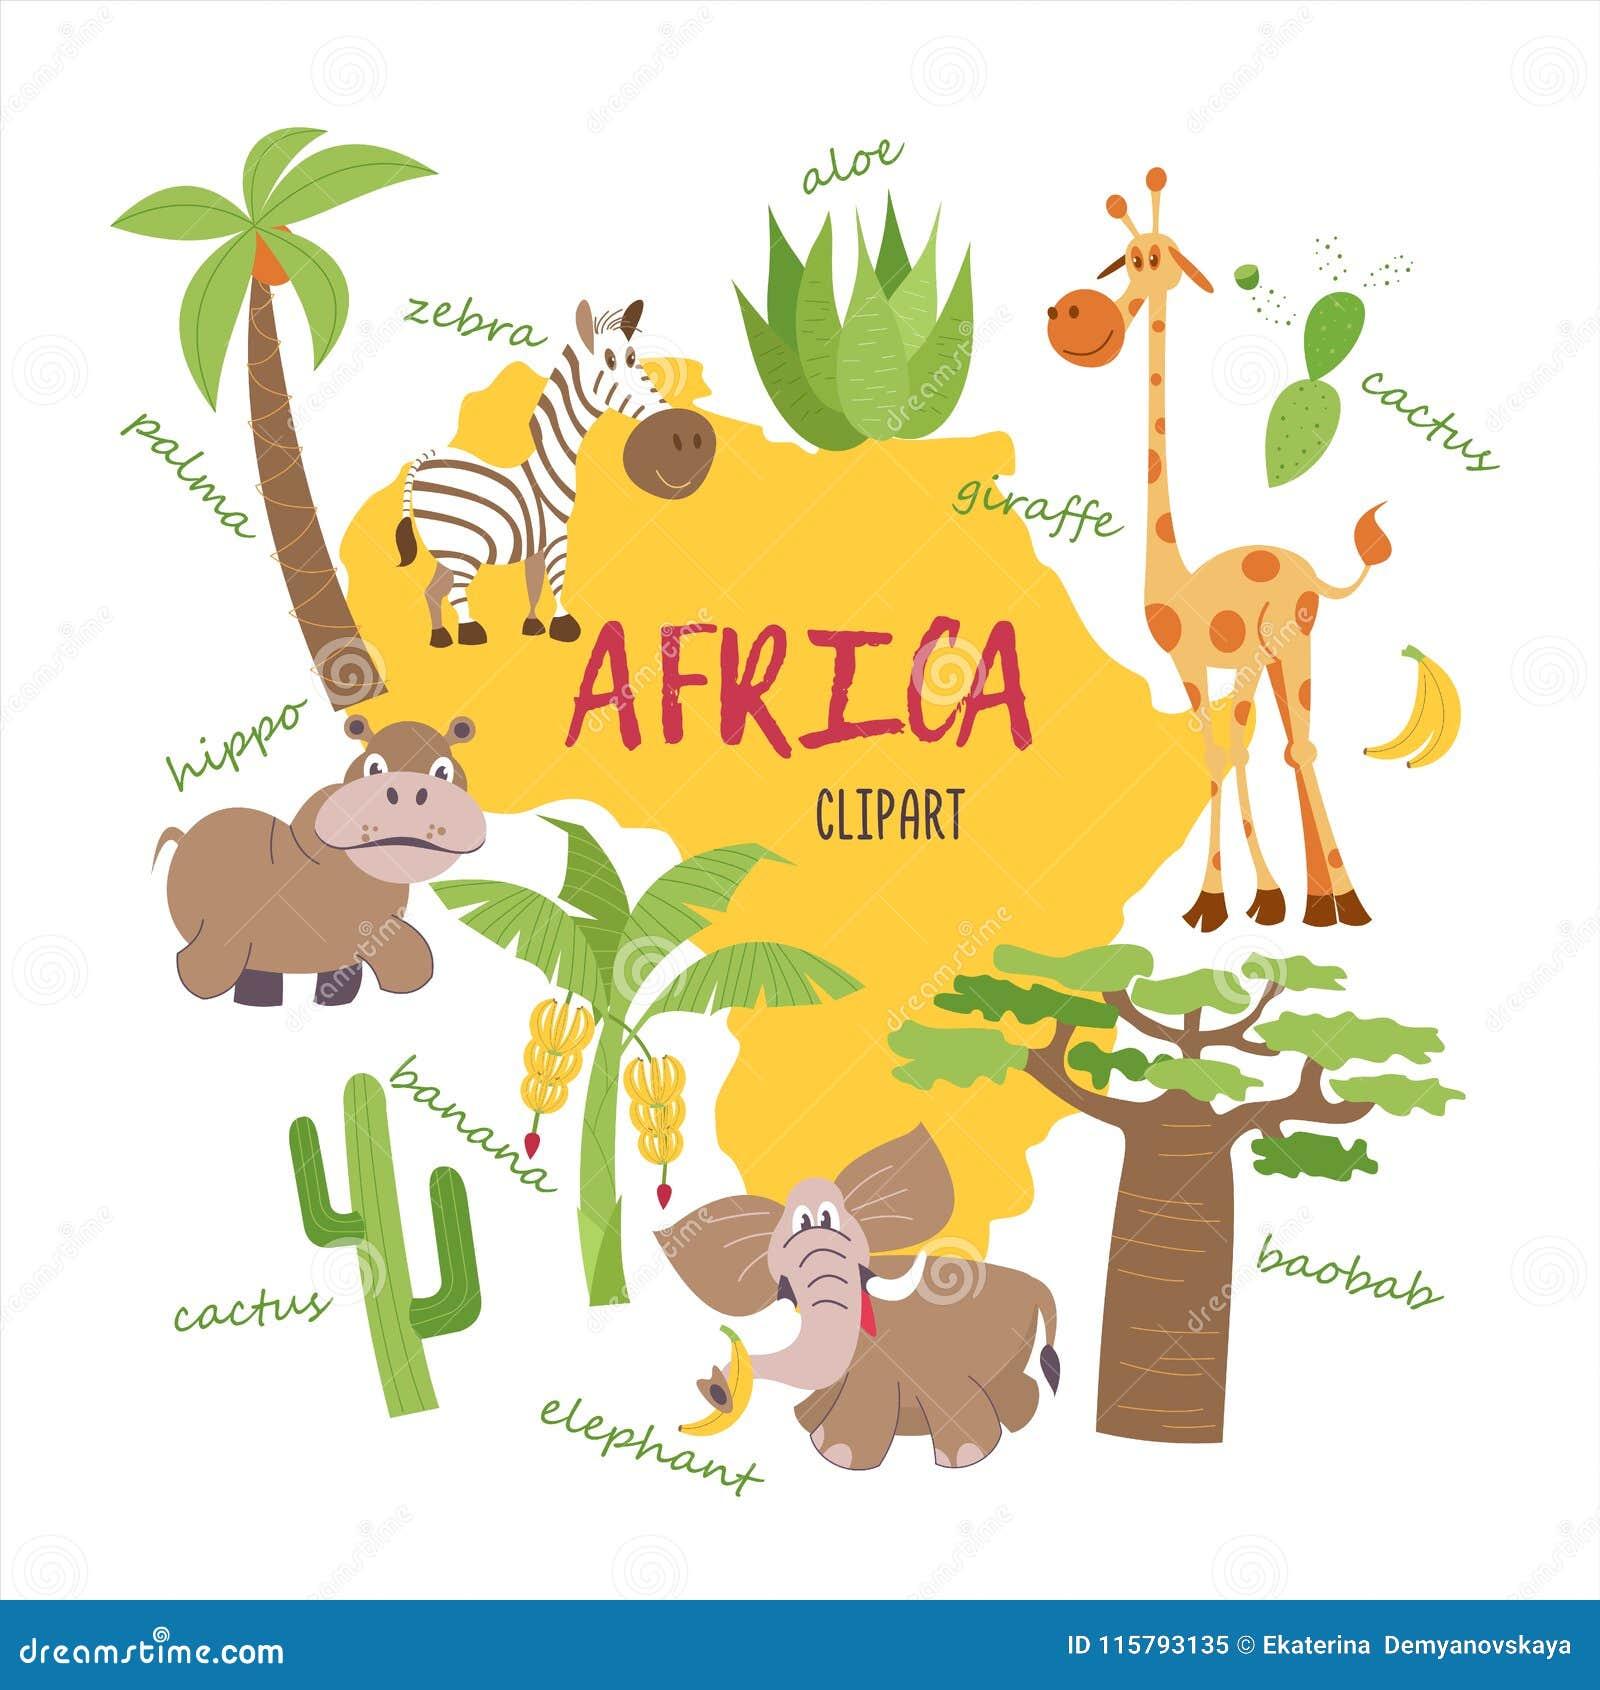 African cartoon animals stock vector. Illustration of funny